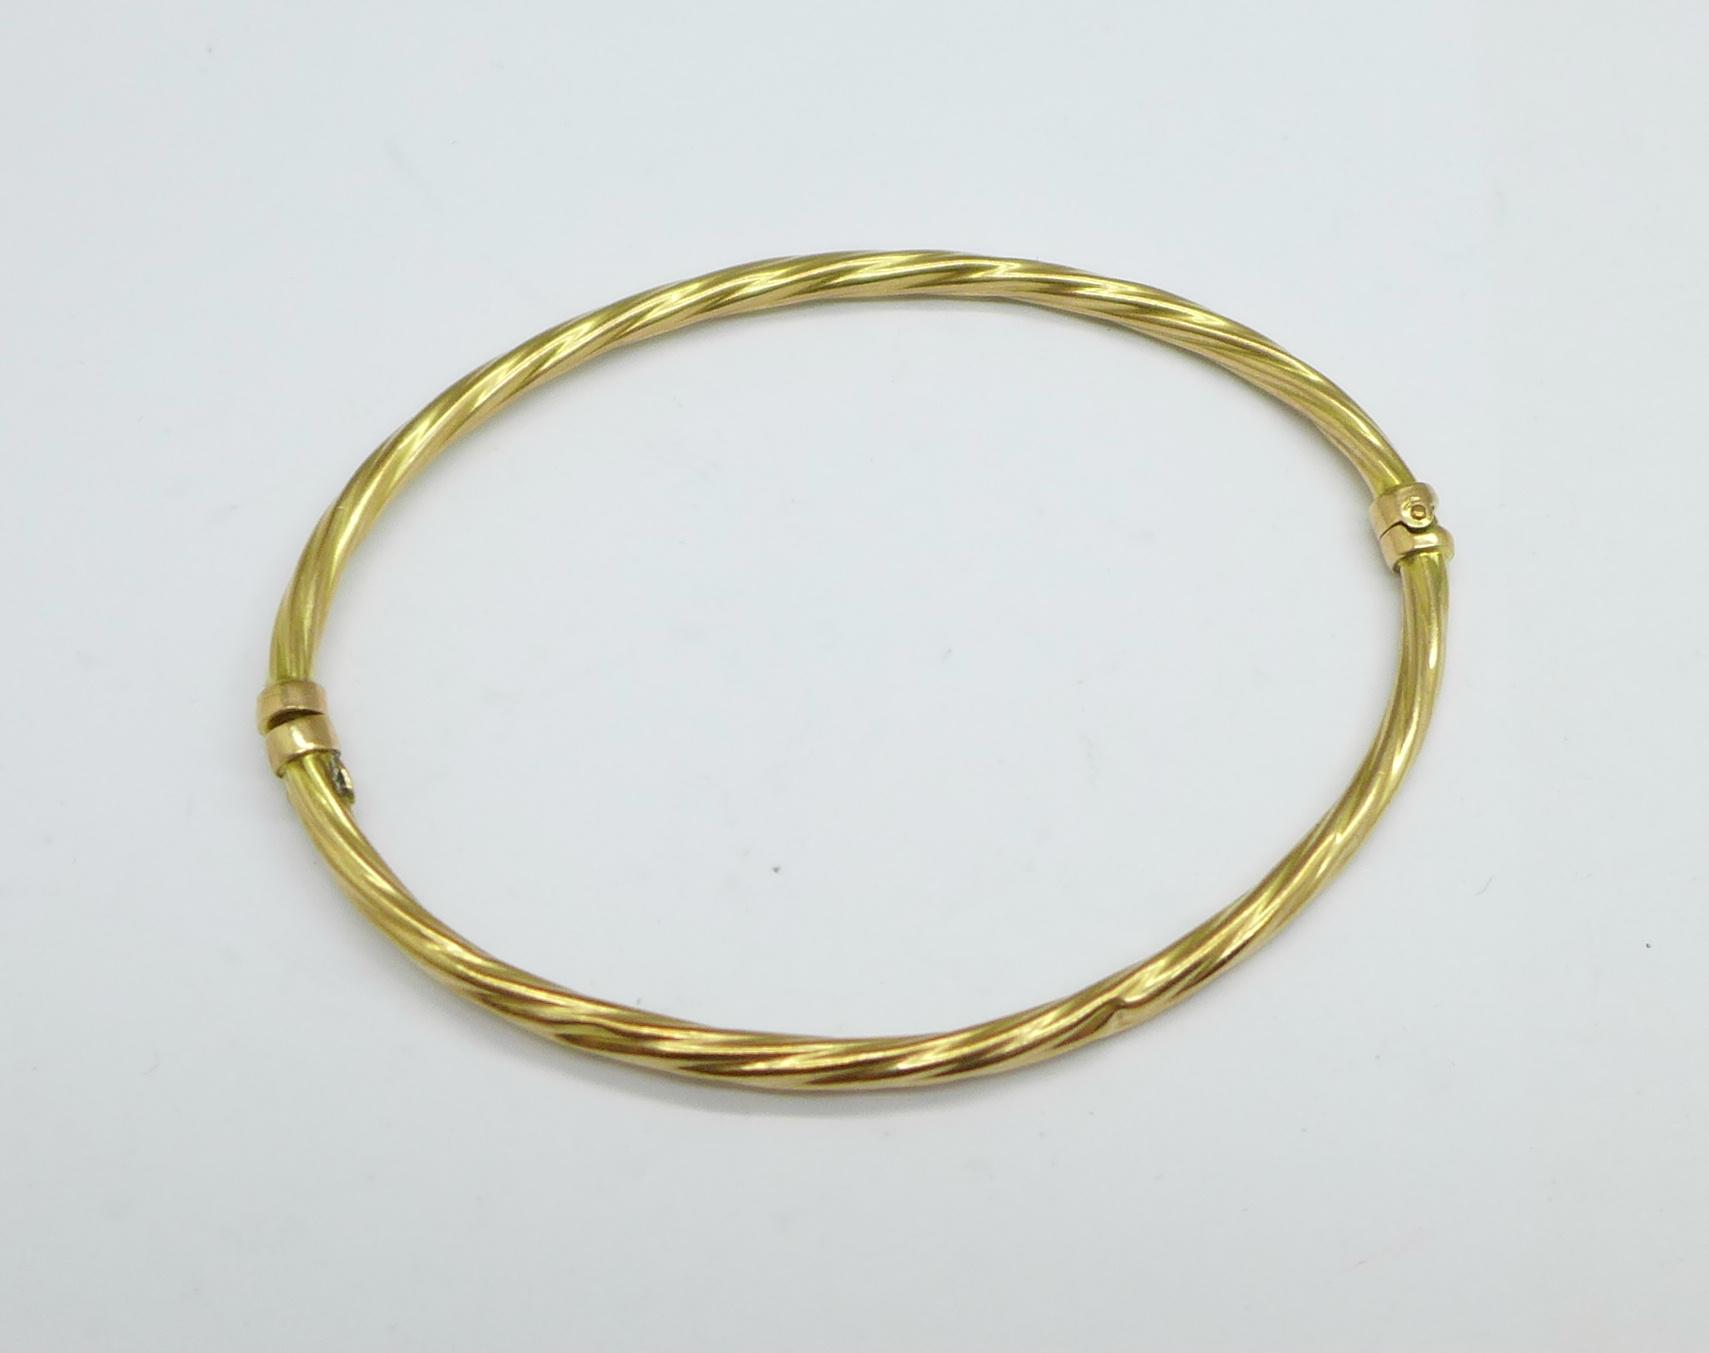 A 9ct gold bangle, 3.2g - Image 2 of 2